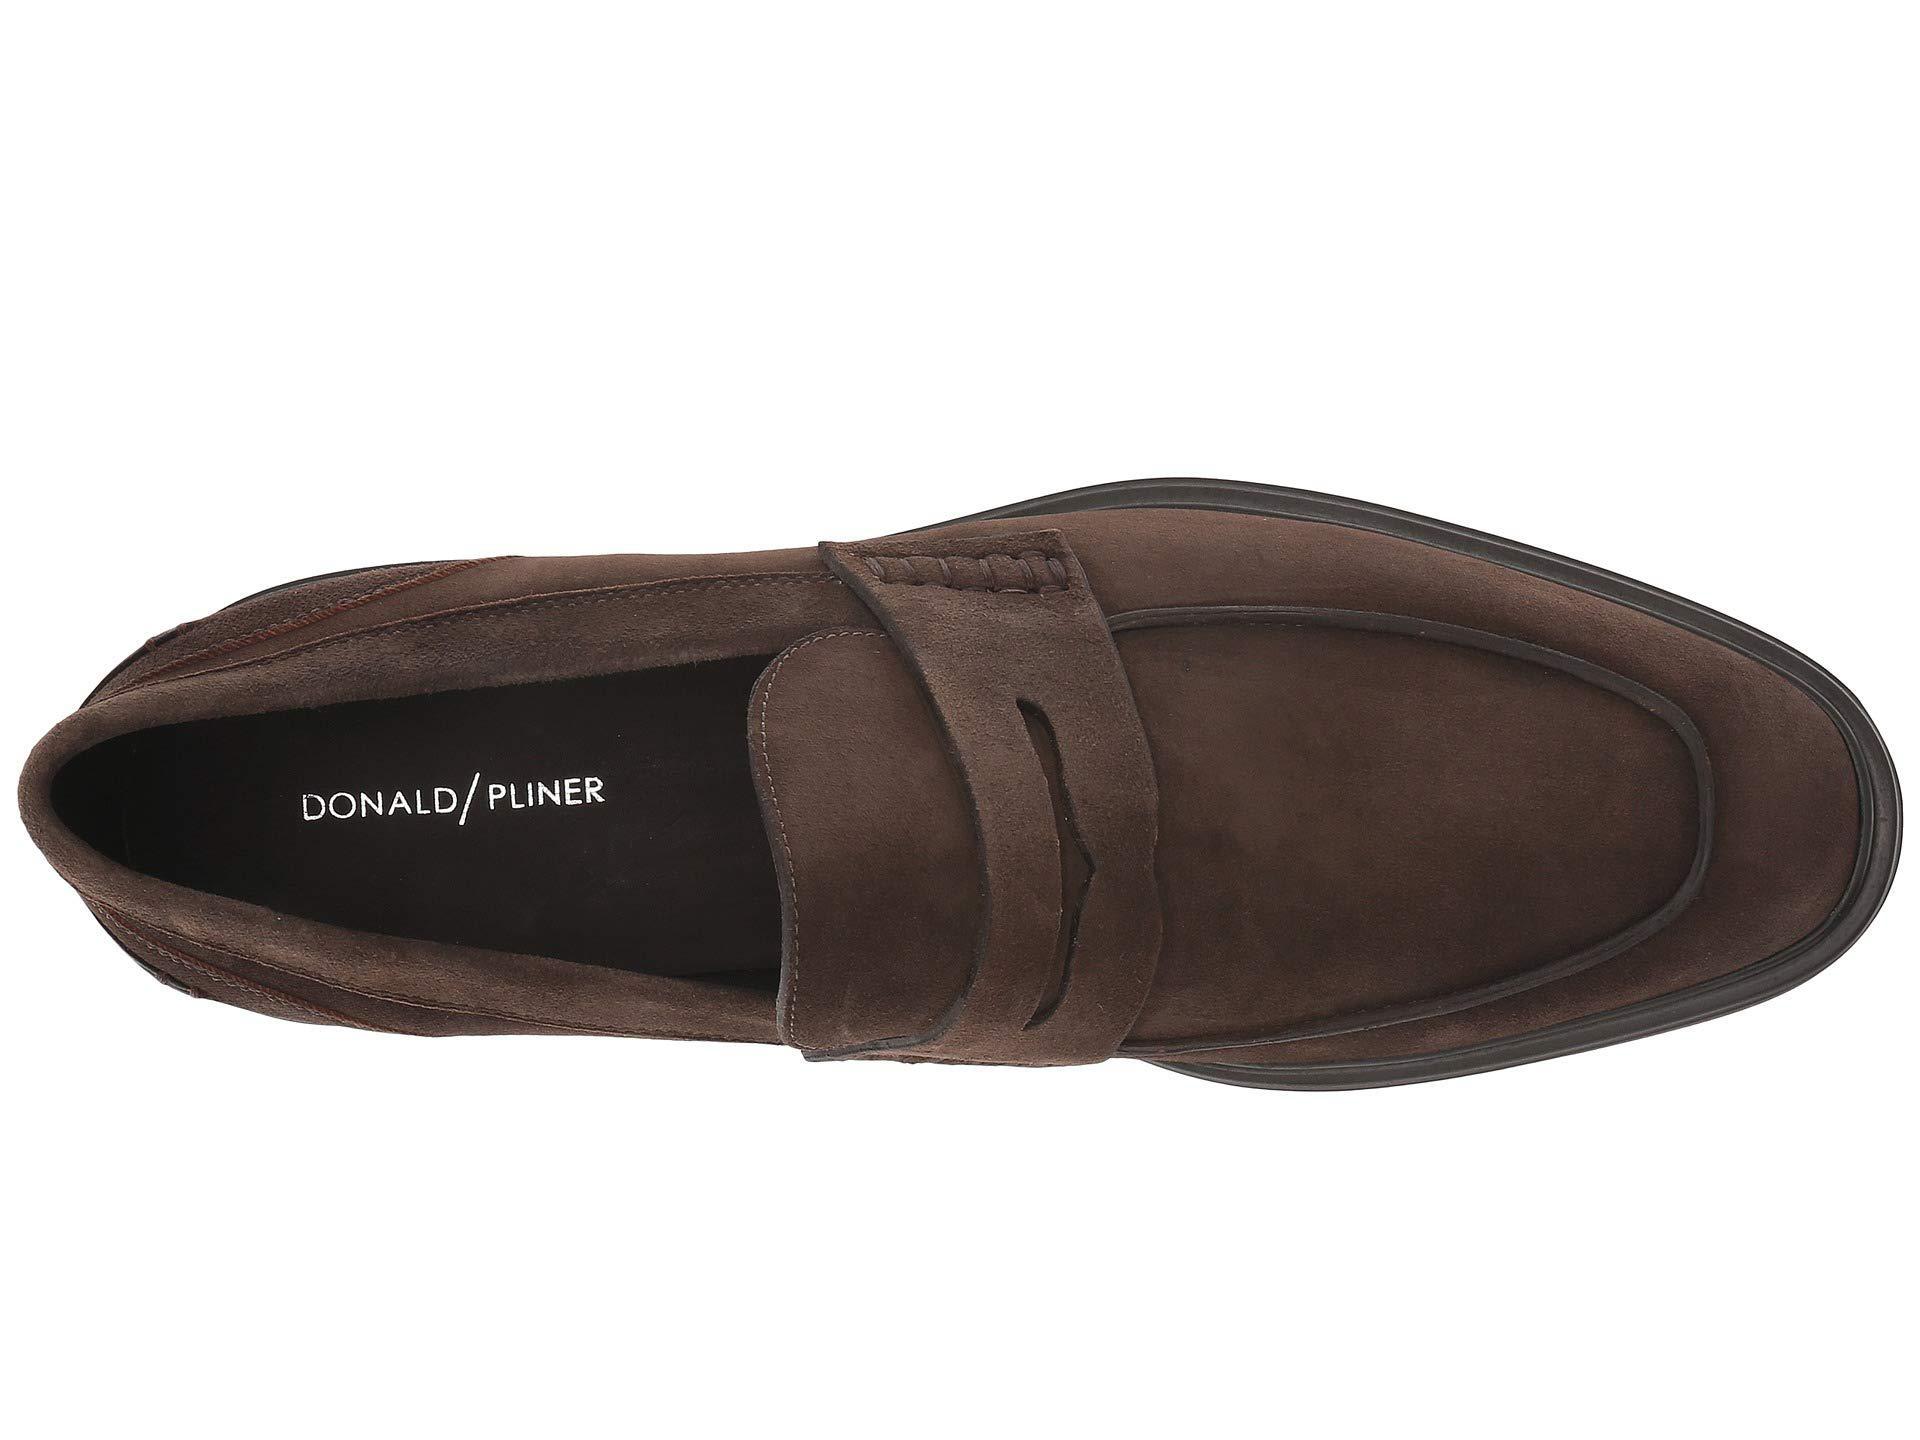 5451734a70c Donald J Pliner - Brown Edmund (expresso Washed Suede) Men s Shoes for Men  -. View fullscreen